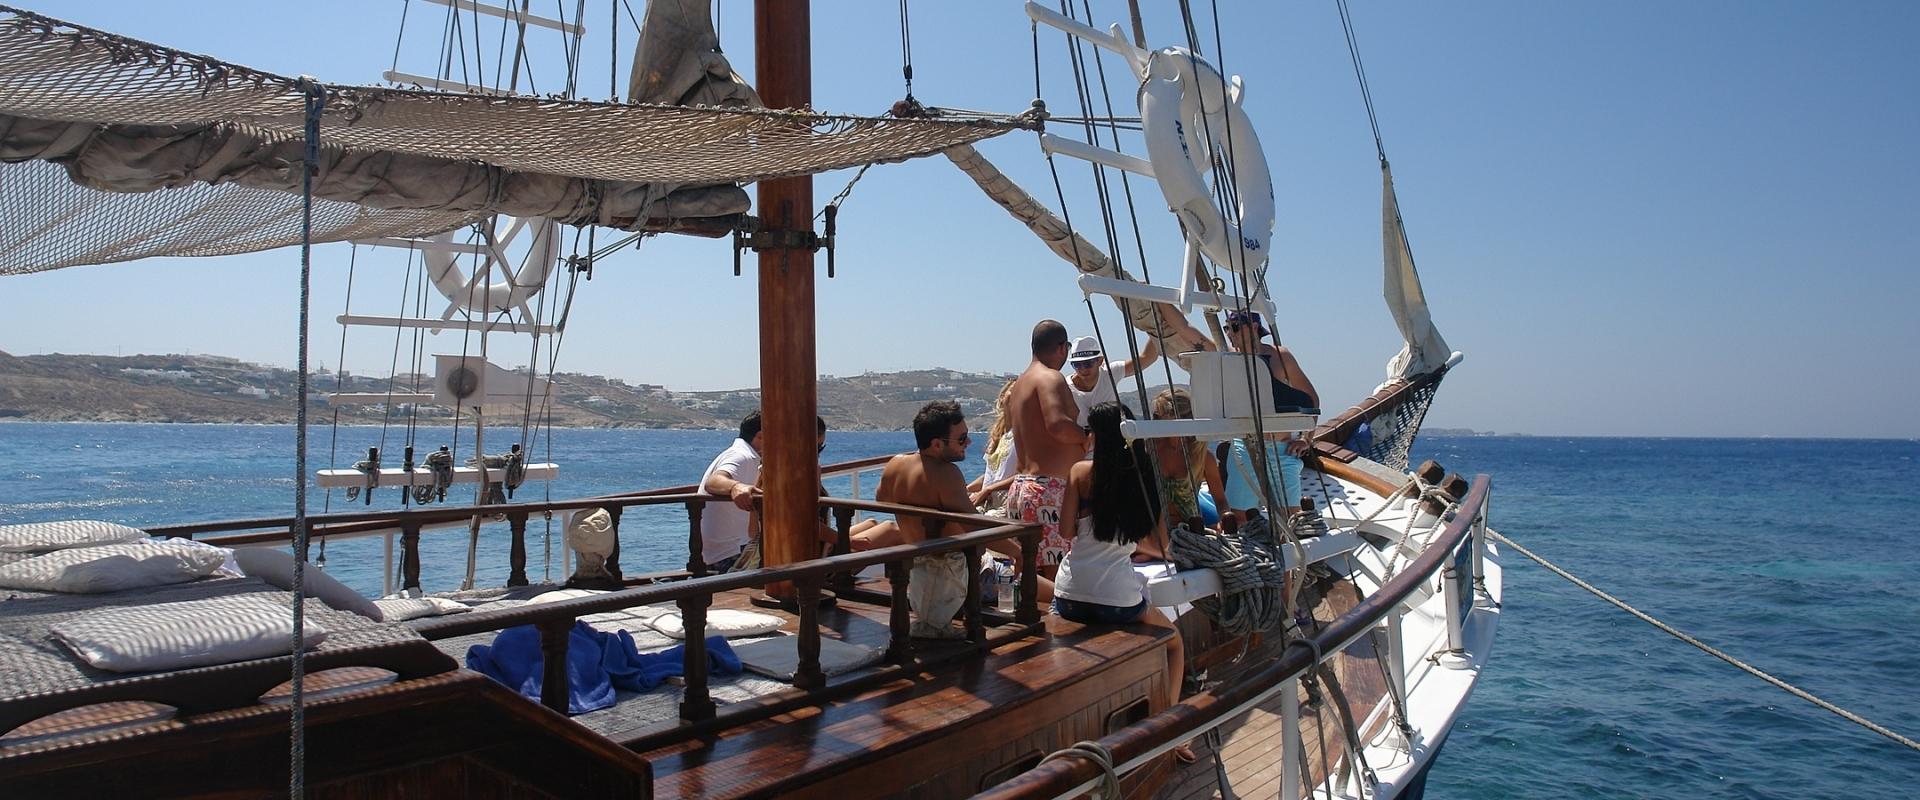 Quarantine of Delos boat